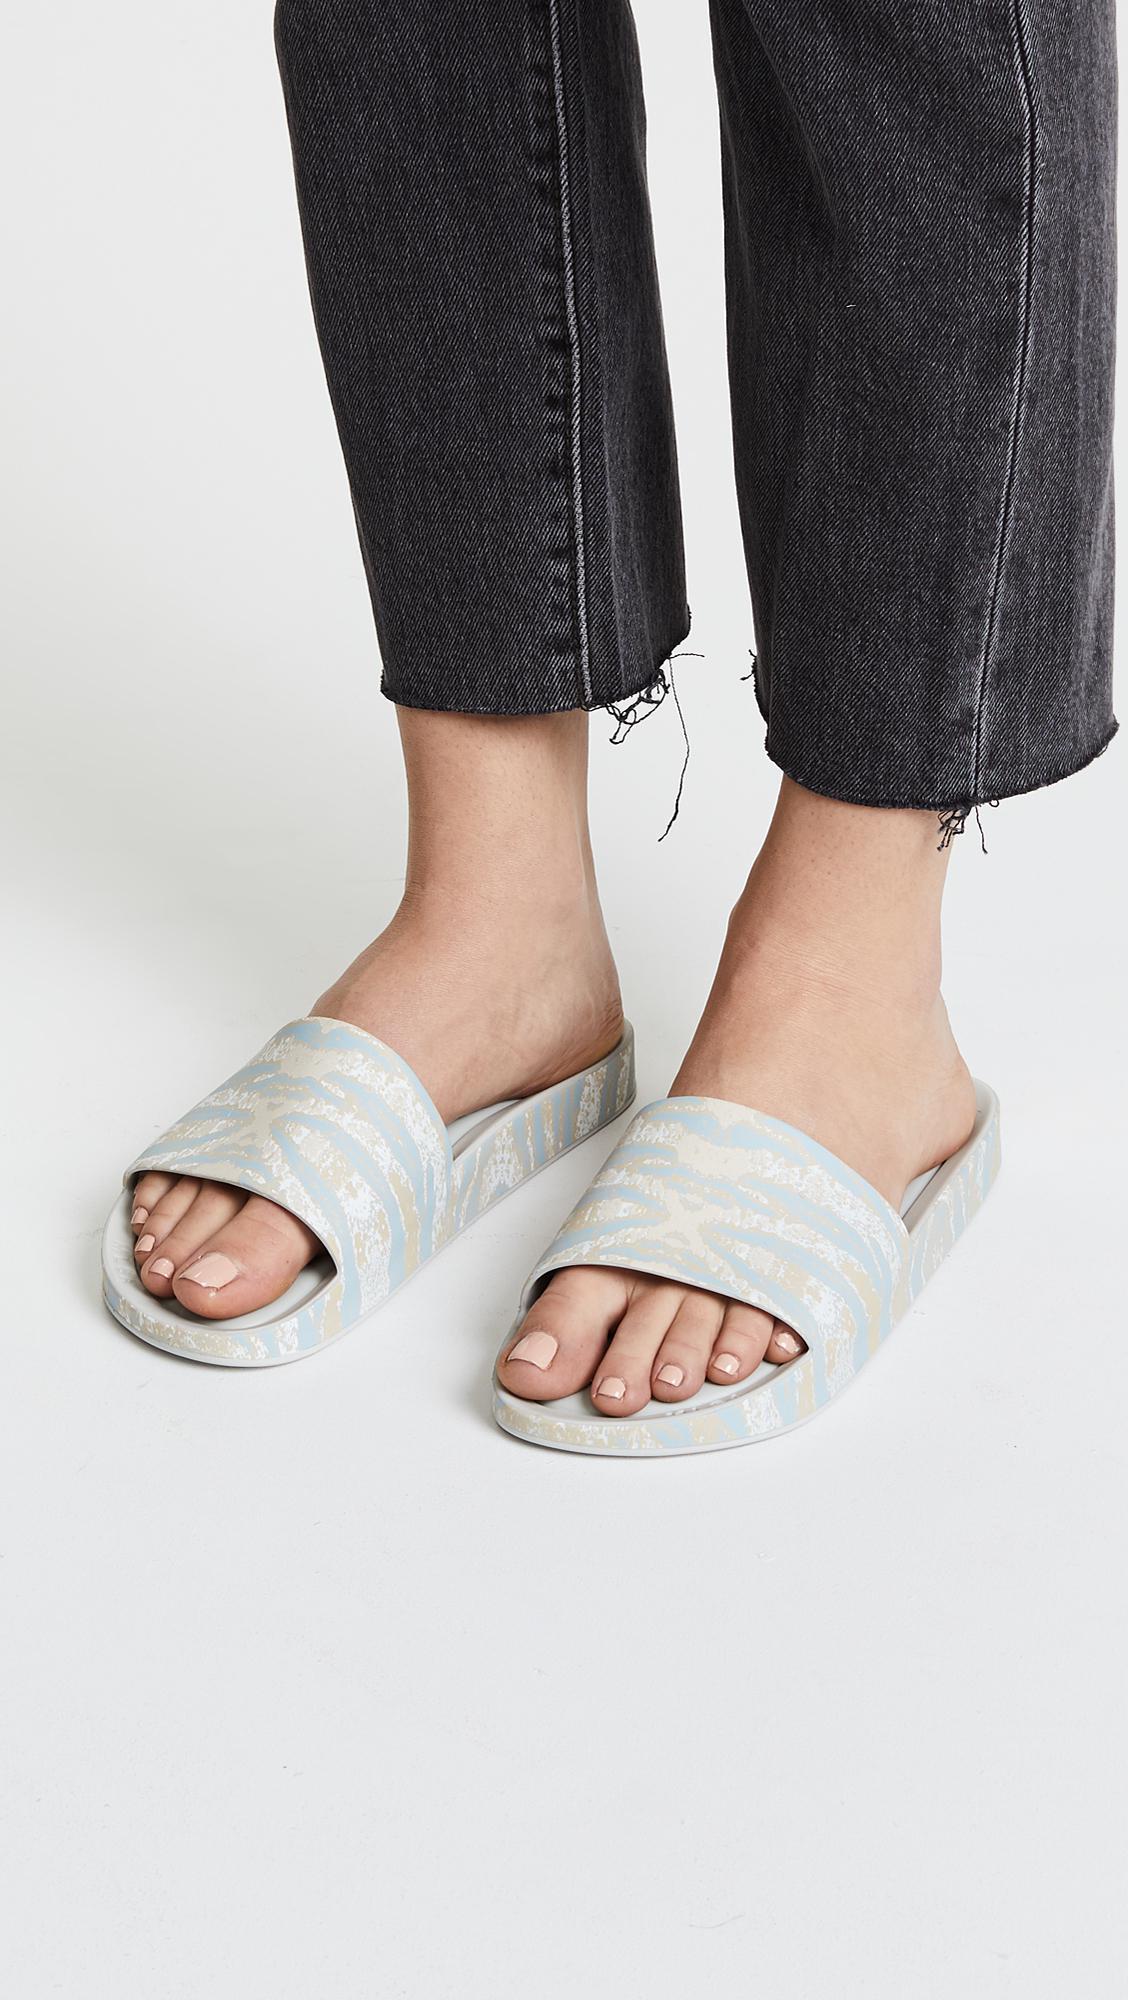 Melissa Shoes x Baja East Beach Slide